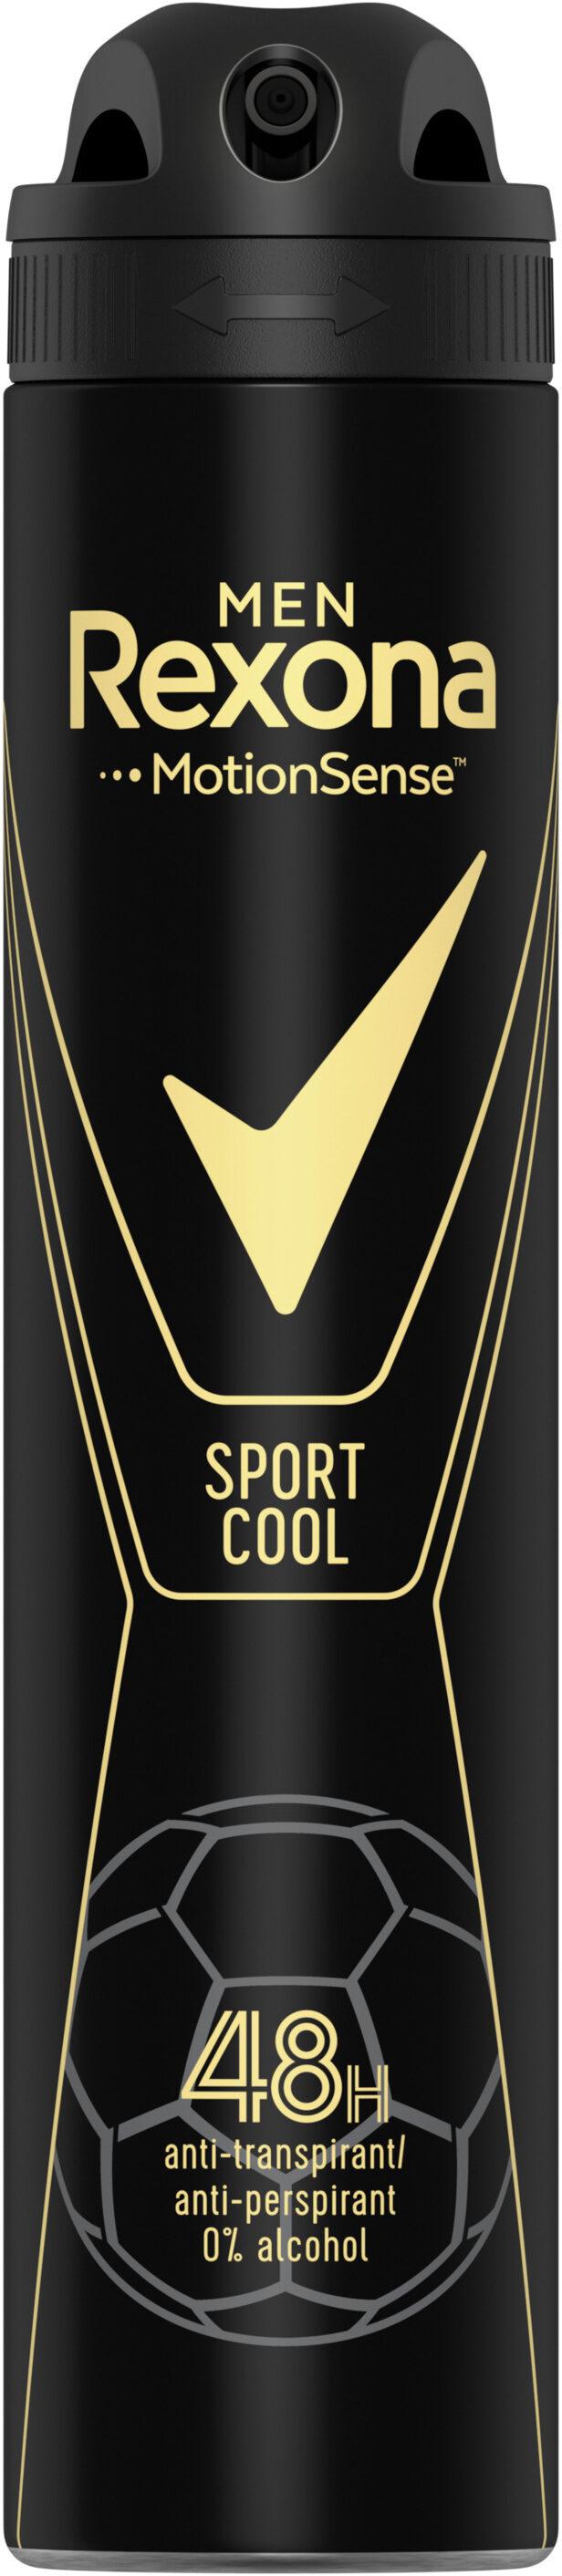 REXONA MEN Déodorant Homme Spray Anti-Transpirant Sport Cool - Product - fr